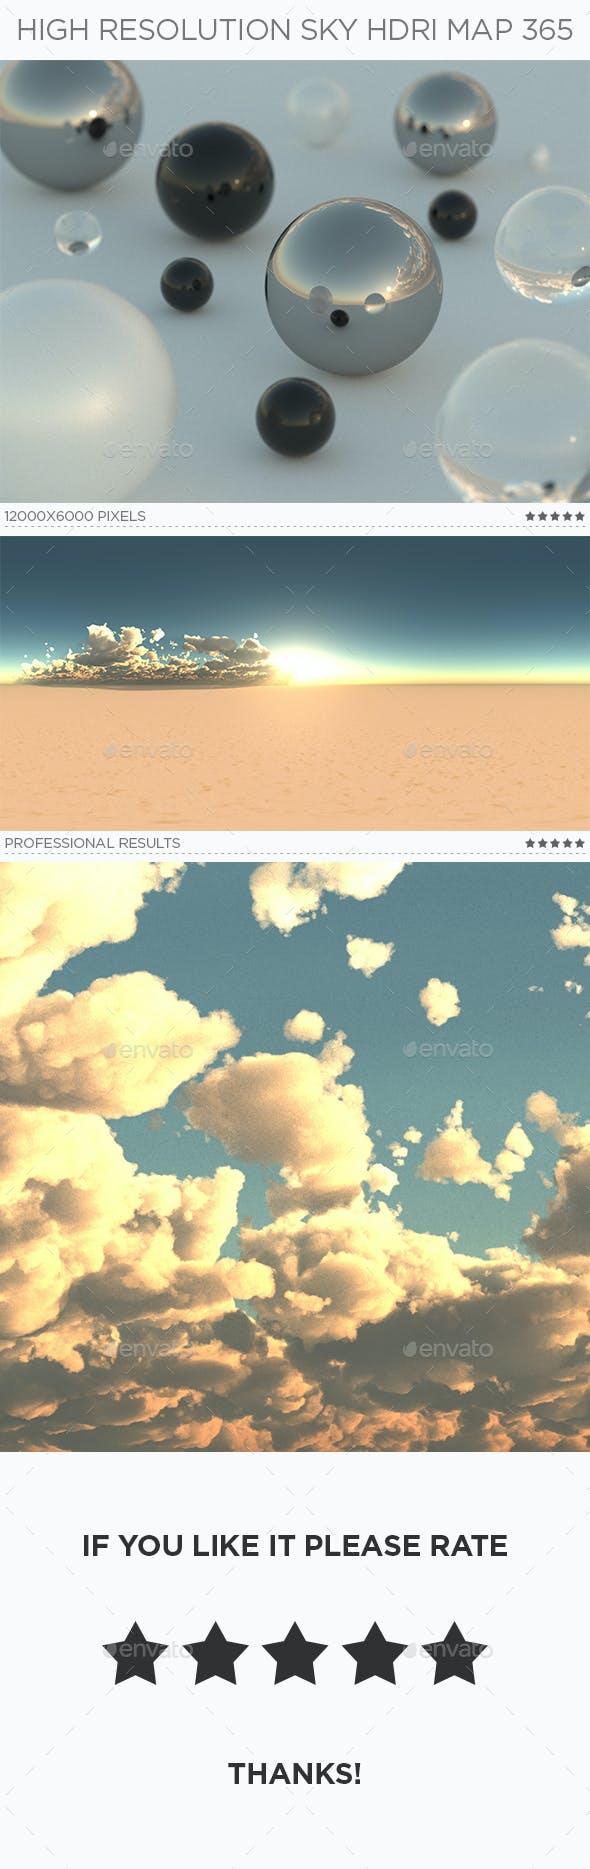 High Resolution Sky HDRi Map 365 - 3DOcean Item for Sale